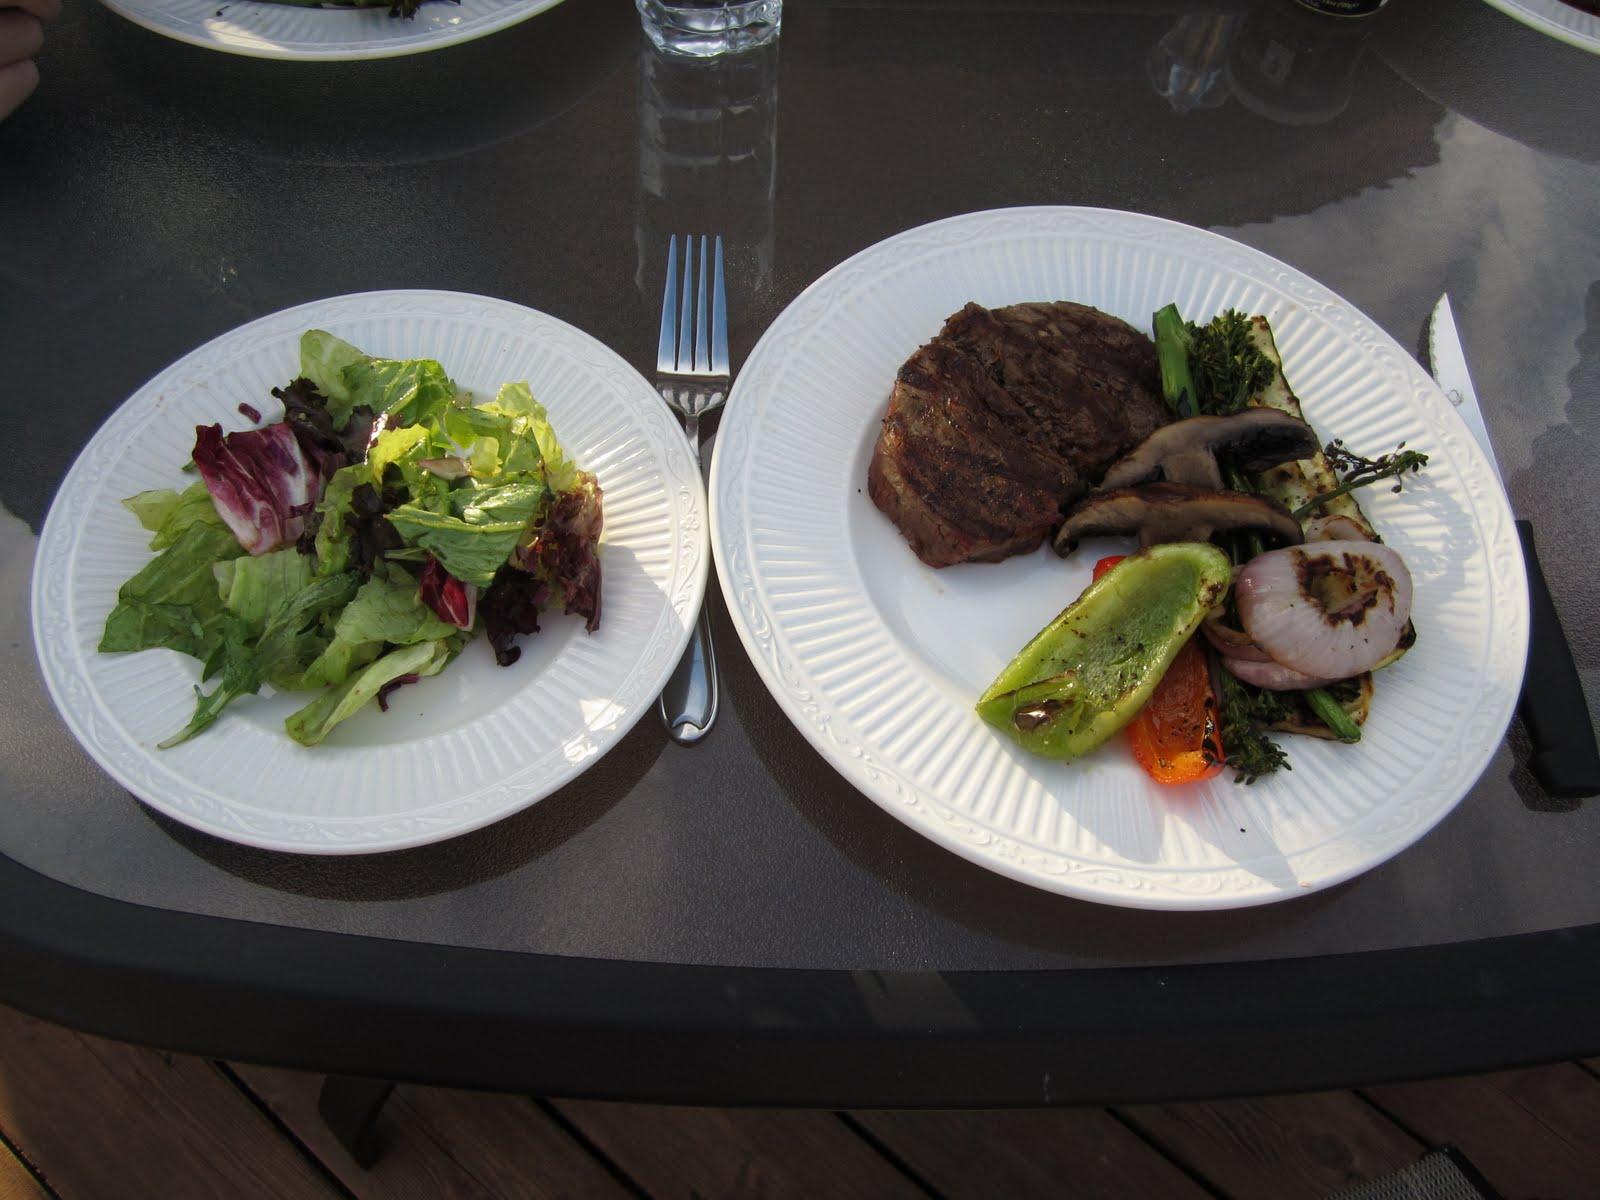 Grilled steak and grilled vegetables